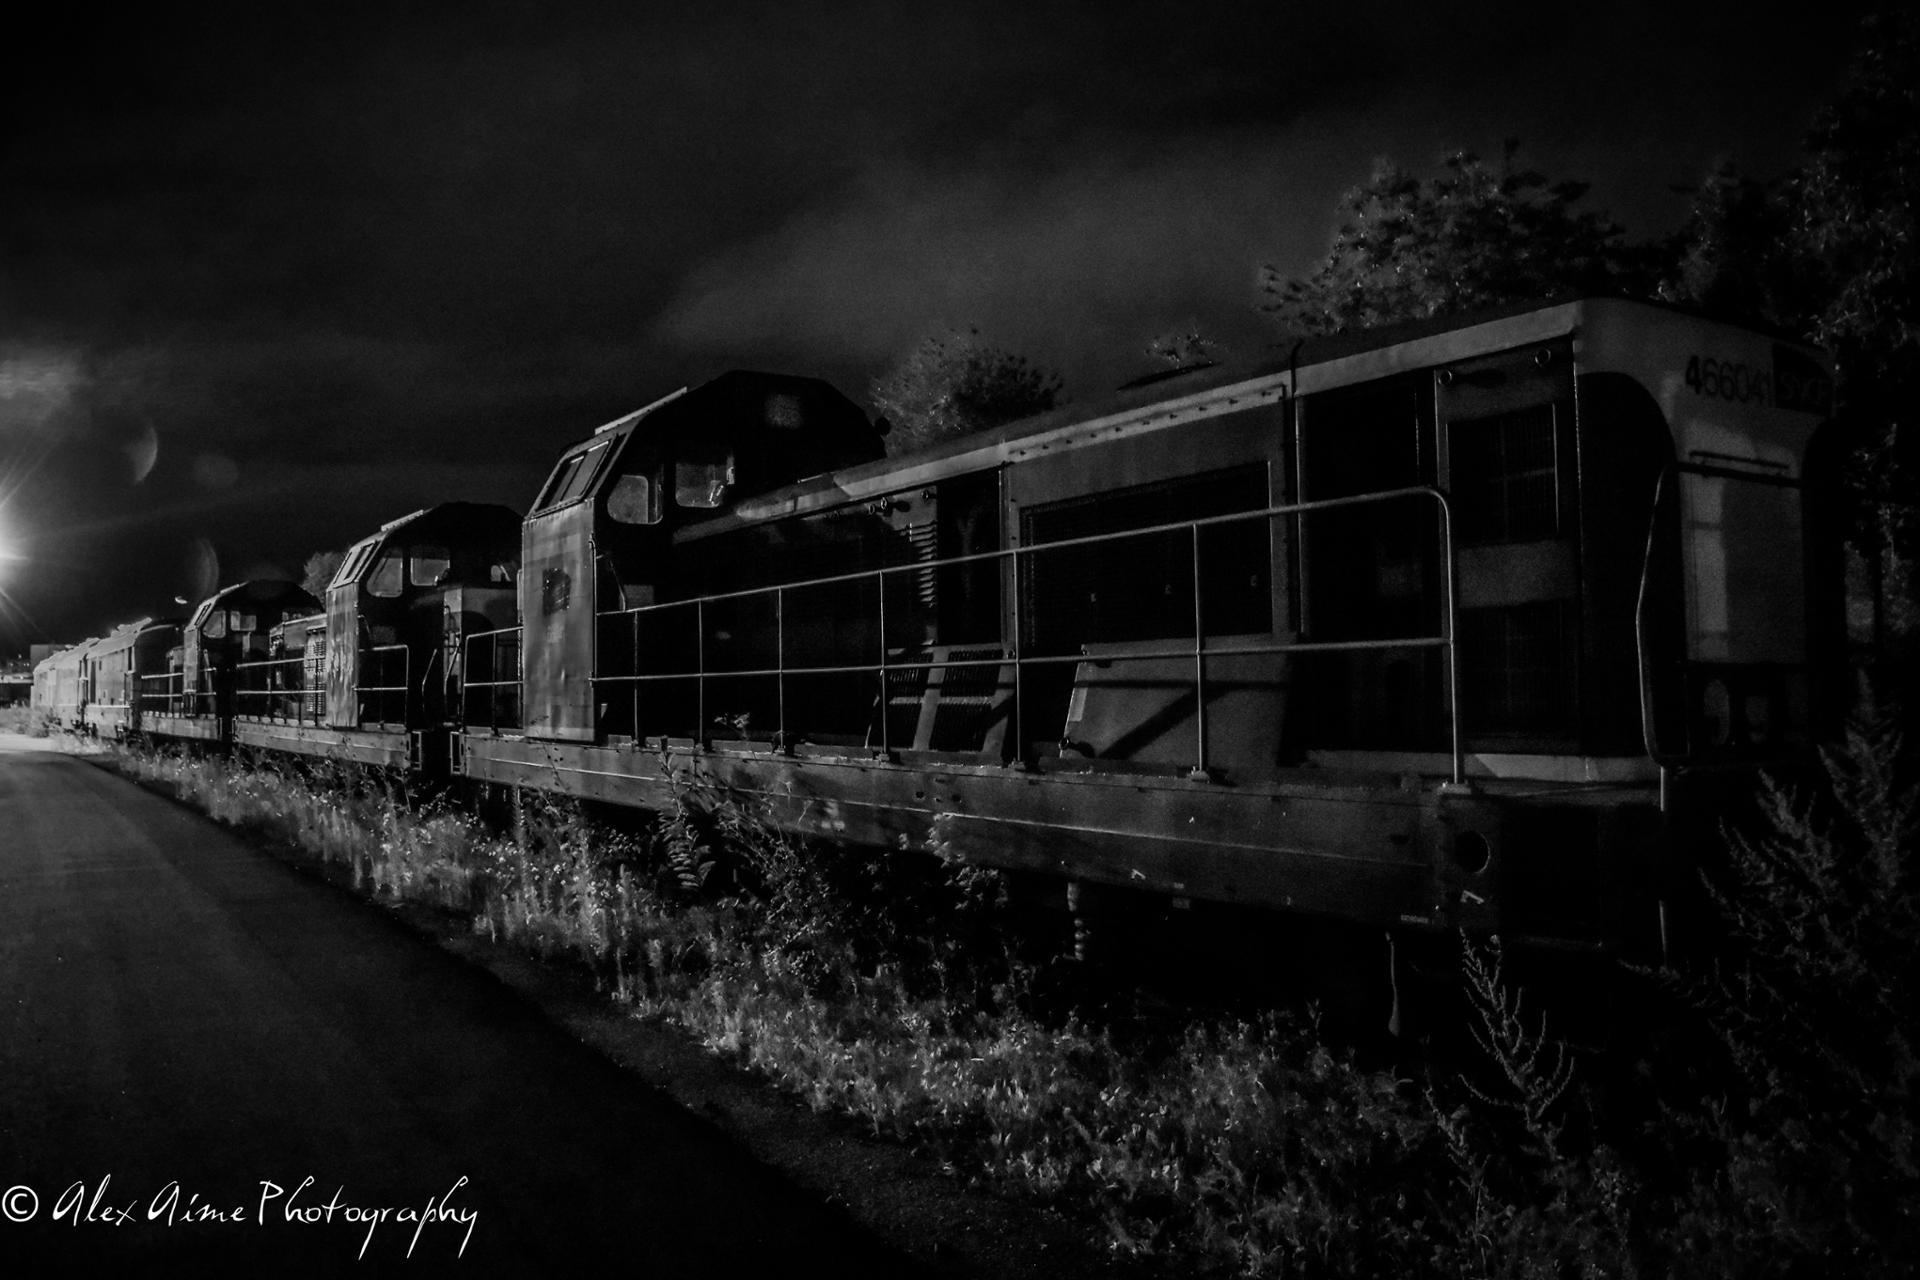 Train urbex #2